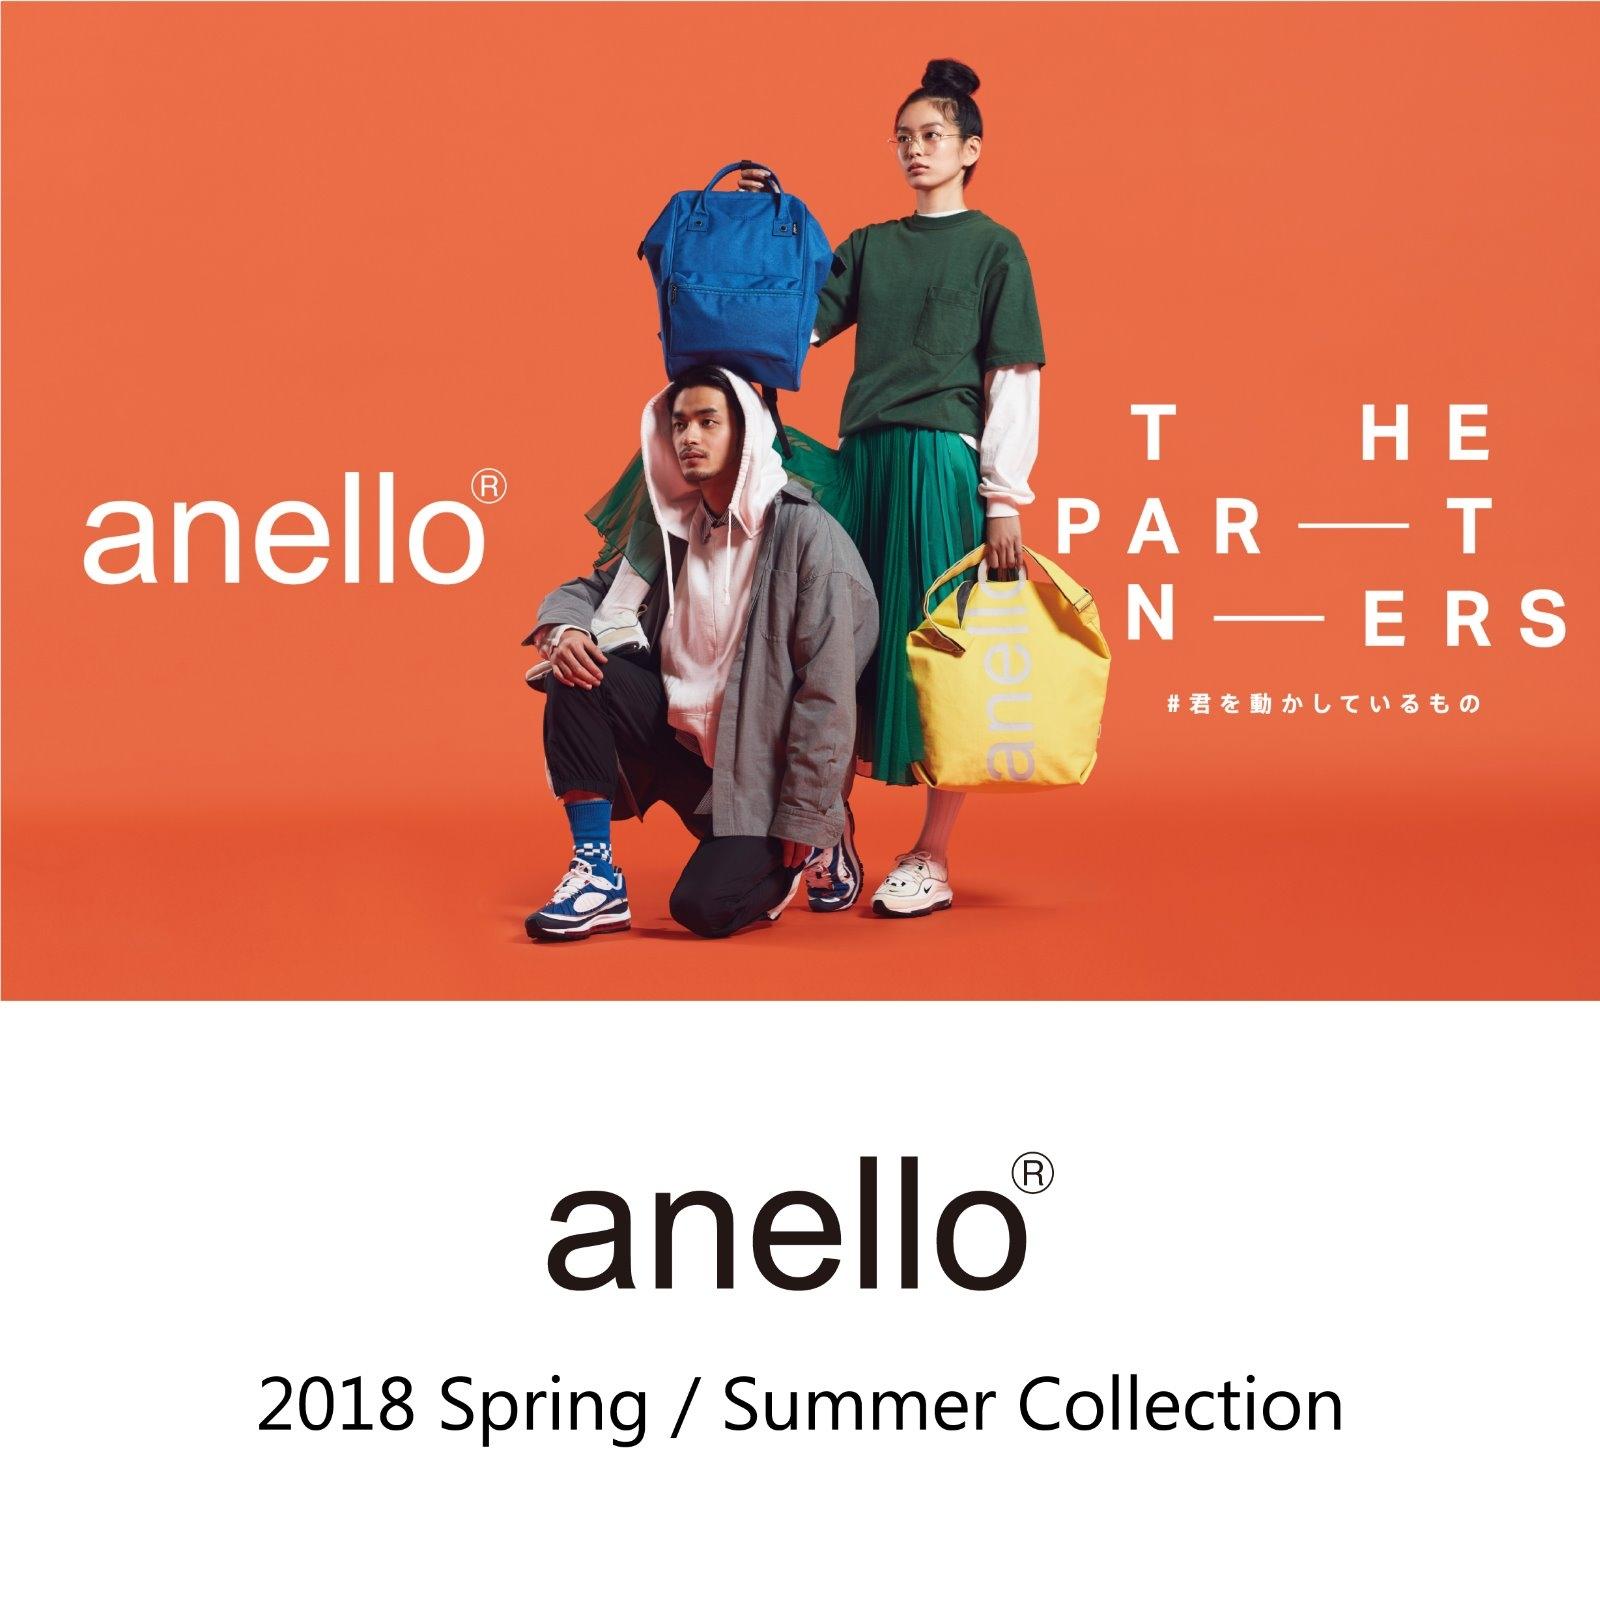 【anello®】 2018 spring/summer コレクションビジュアル/プロモーションビデオ公開!